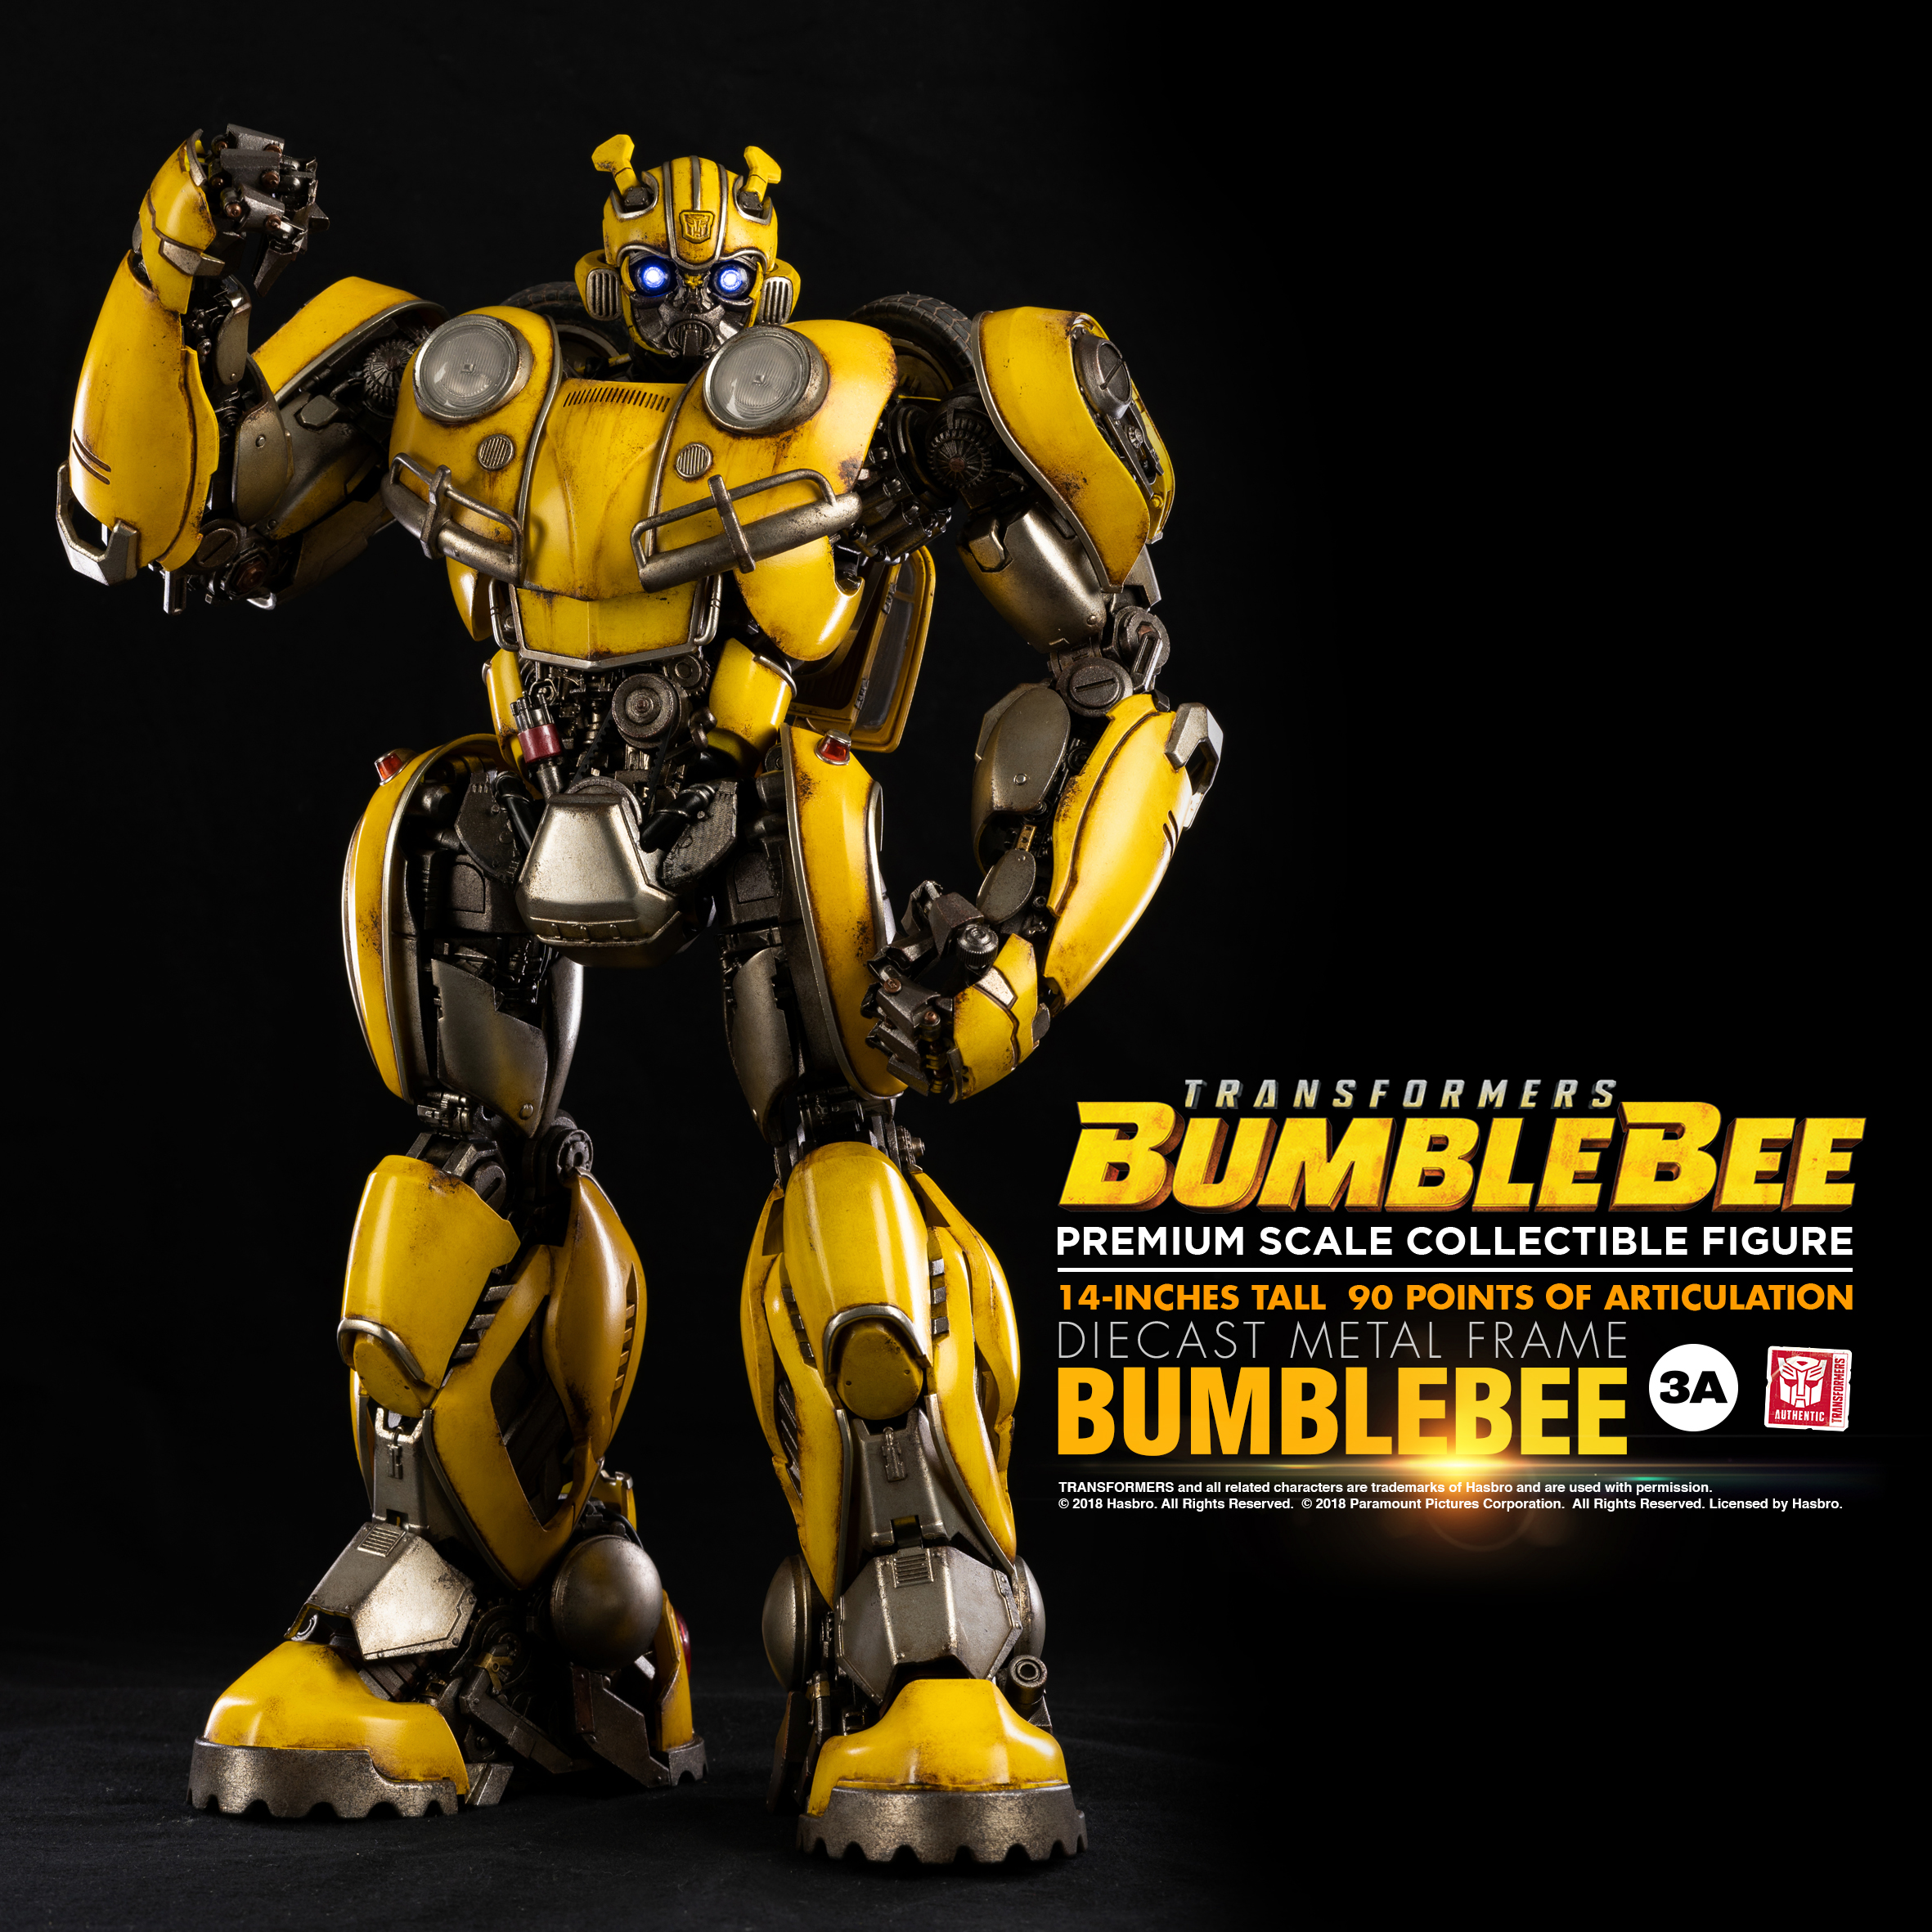 Bumblebee_ENG_PM_SQUARE_006.jpg